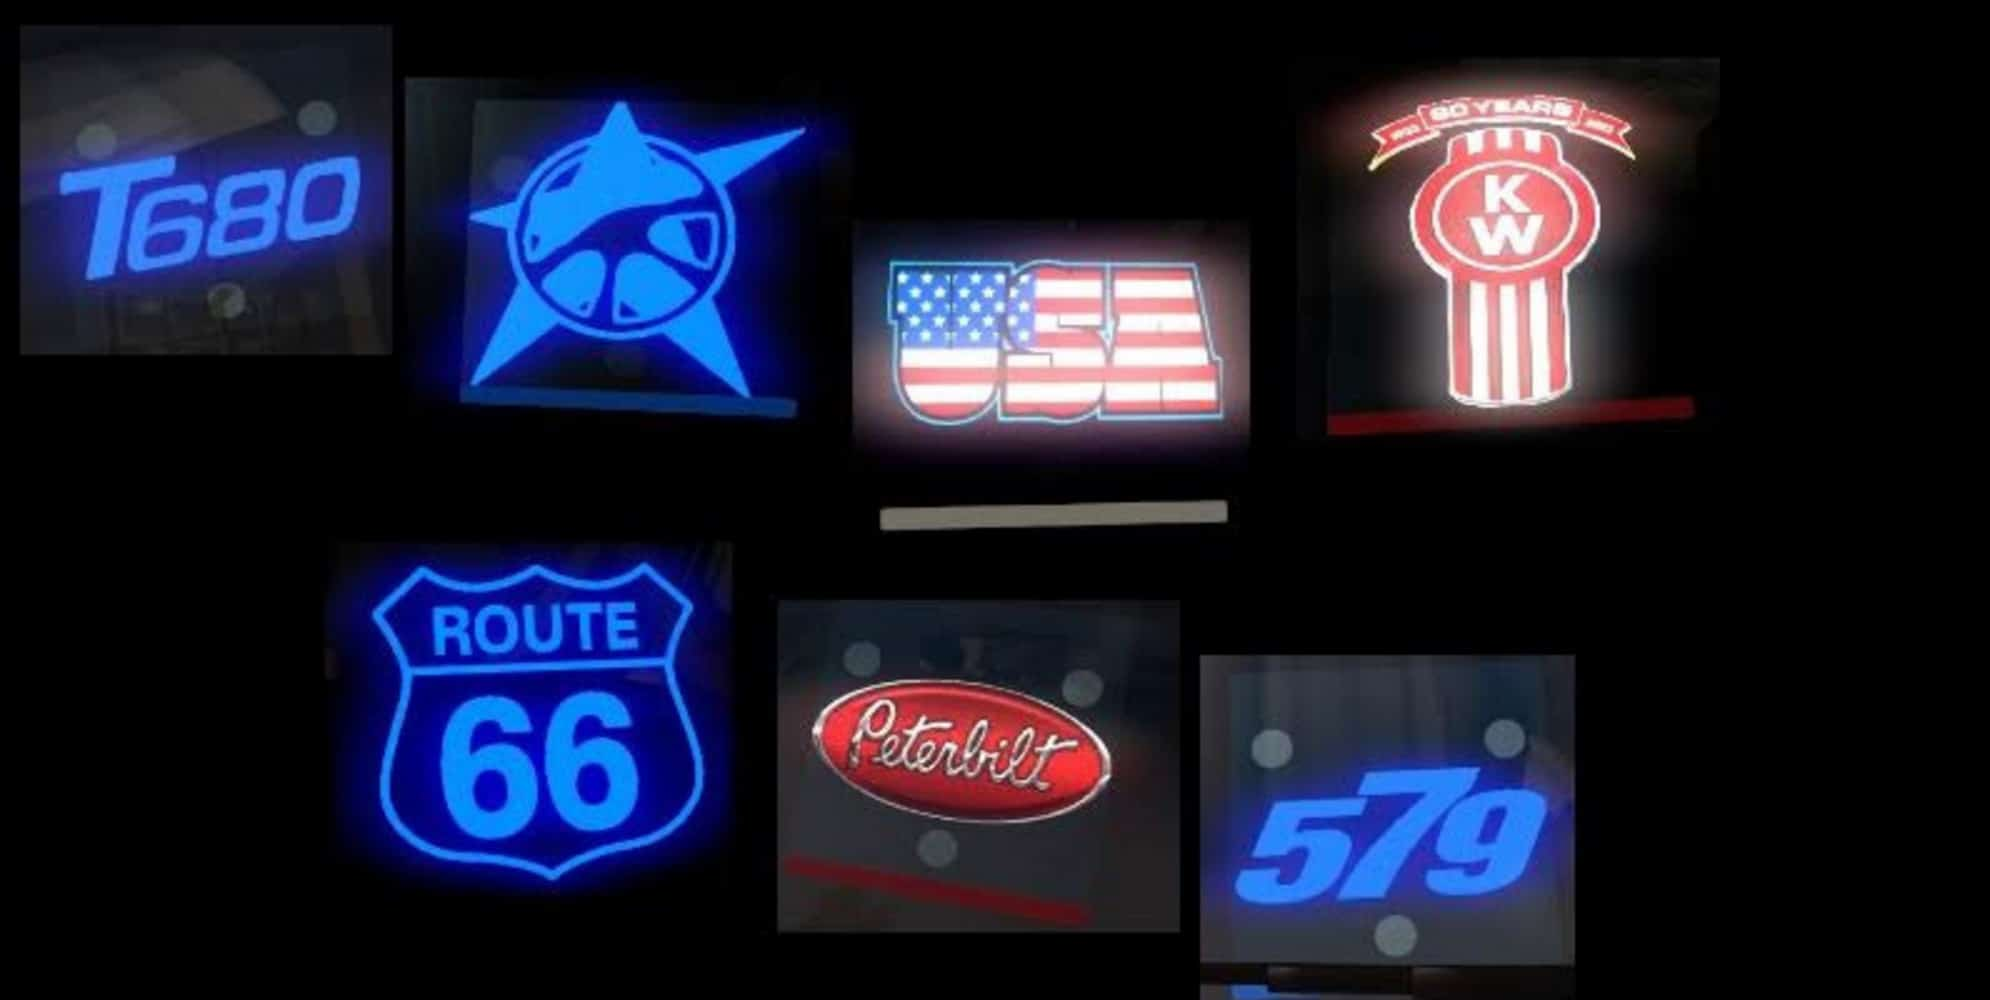 Ats Led Plates Mod American Truck Simulator Mod Ats Mod